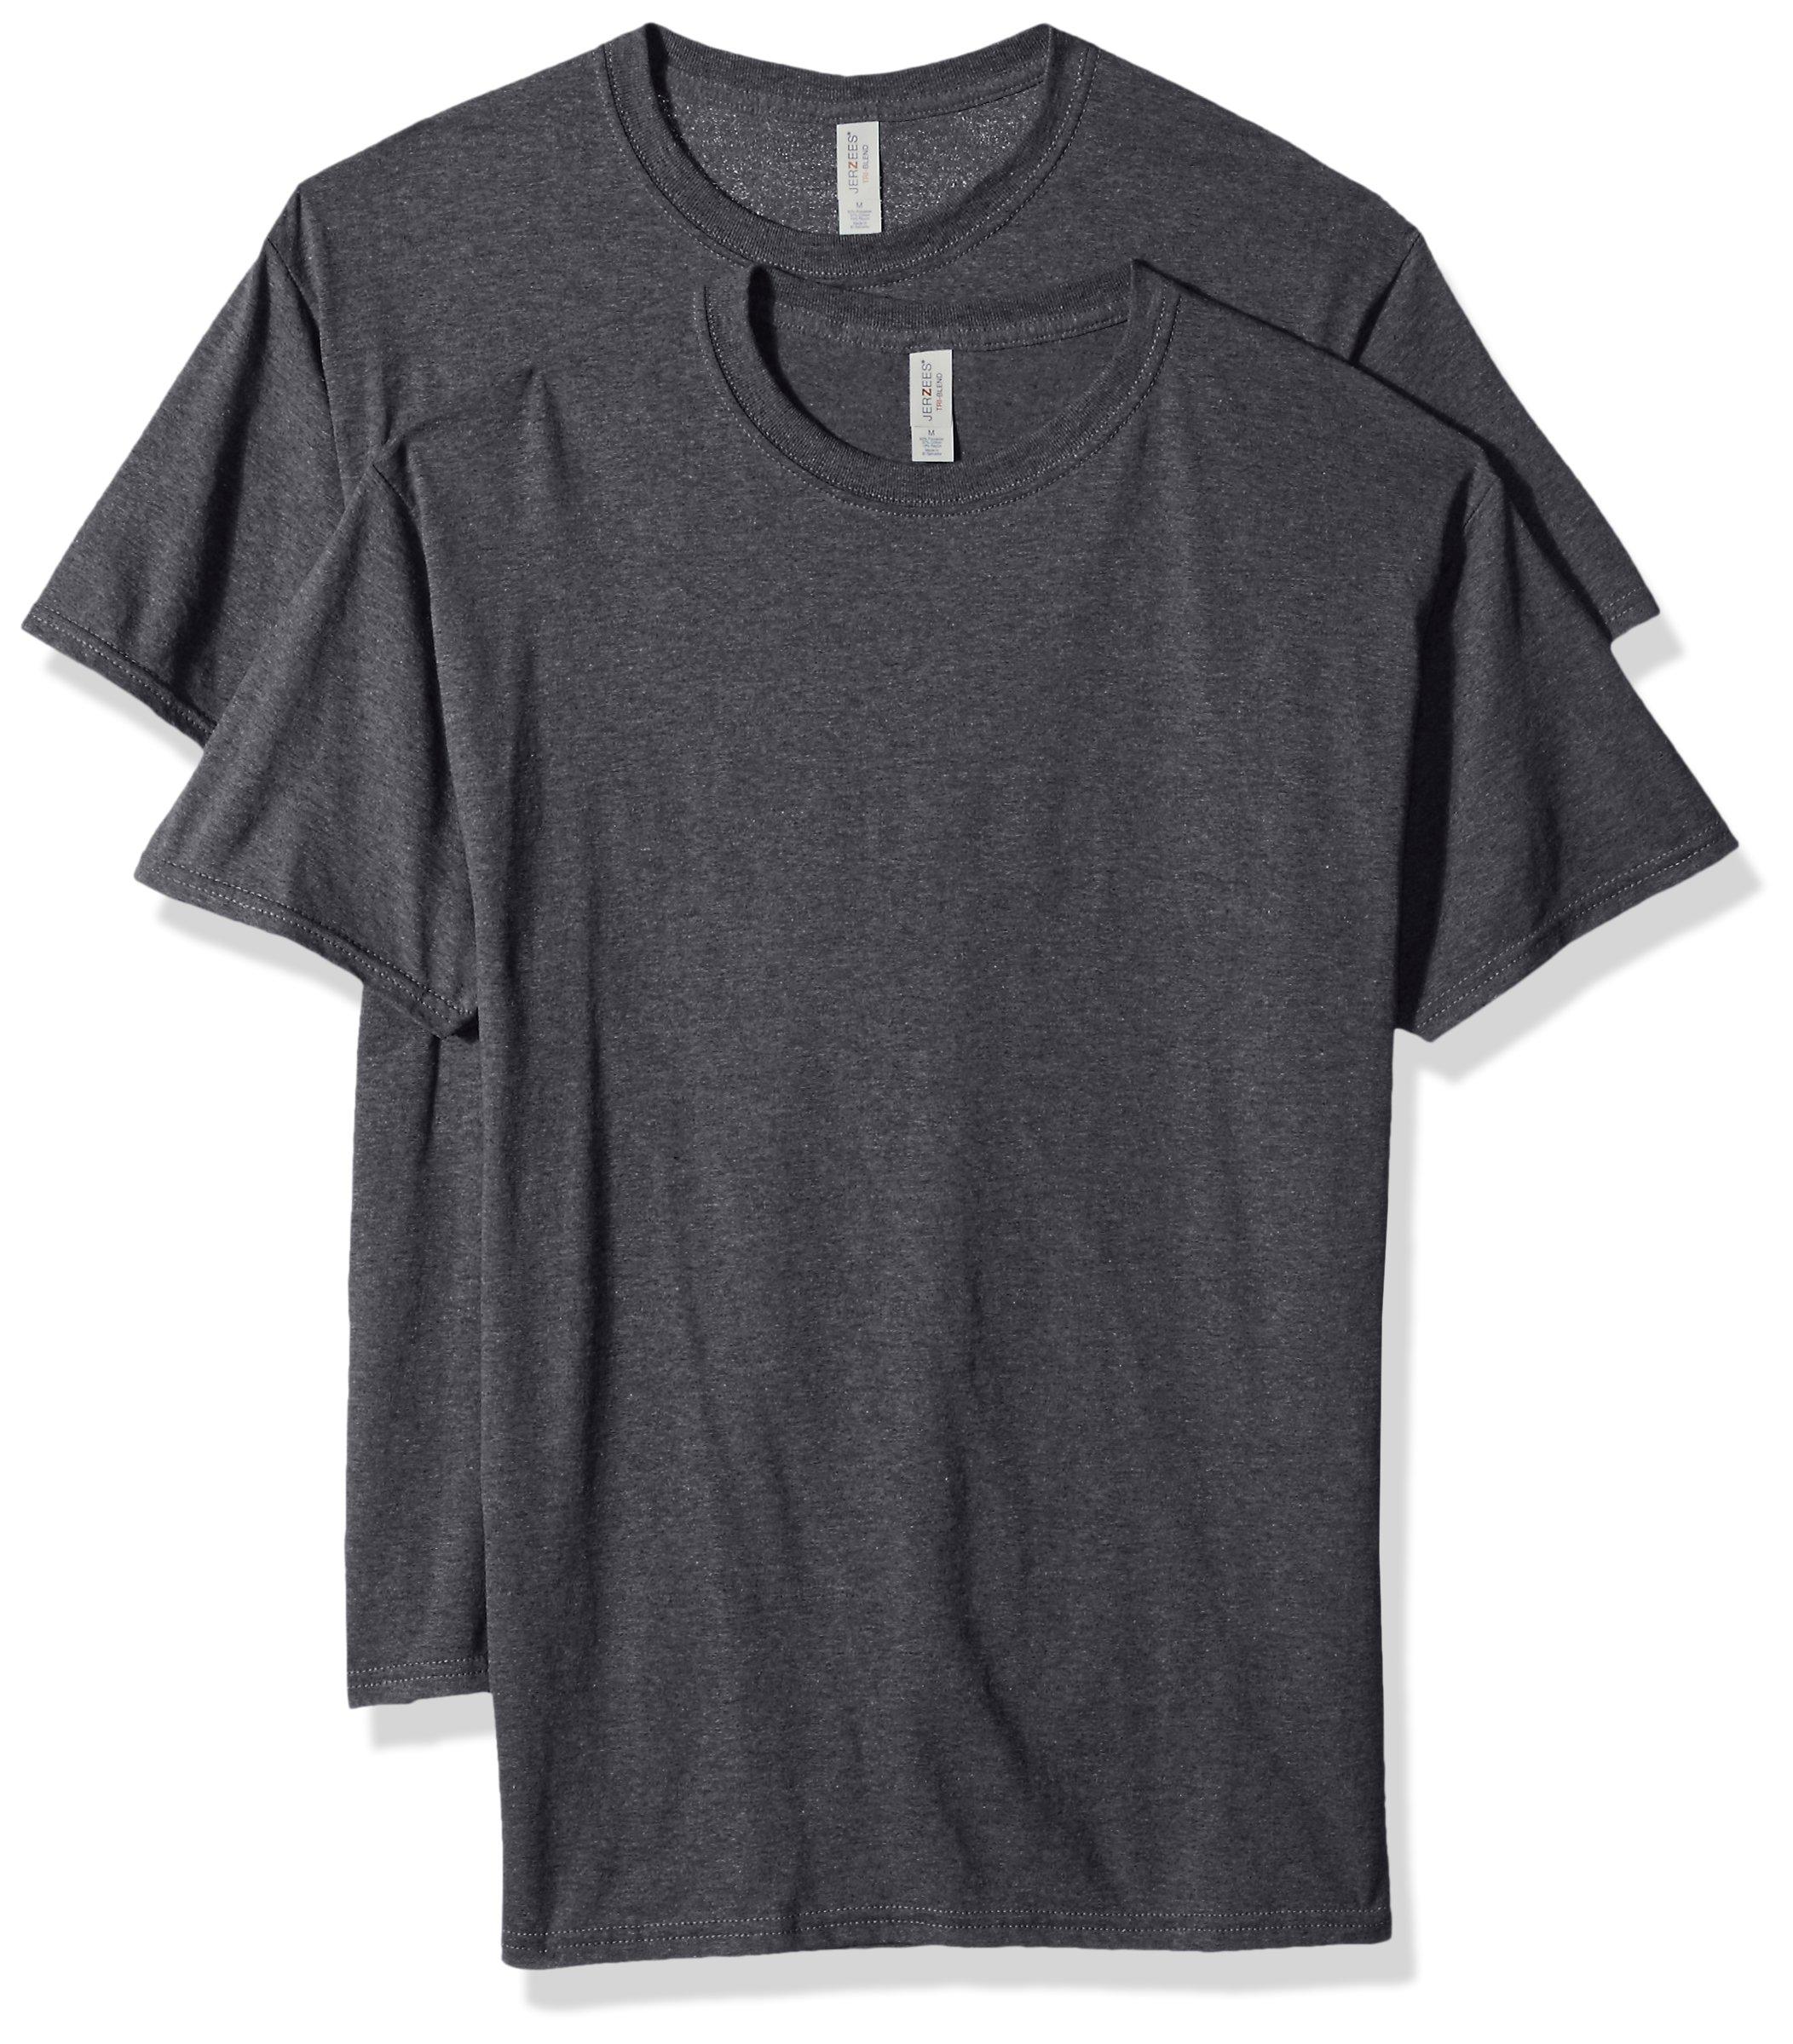 Jerzees Men's Tri-Blend 2 Pack T-Shirt, Black Heather, X-Large